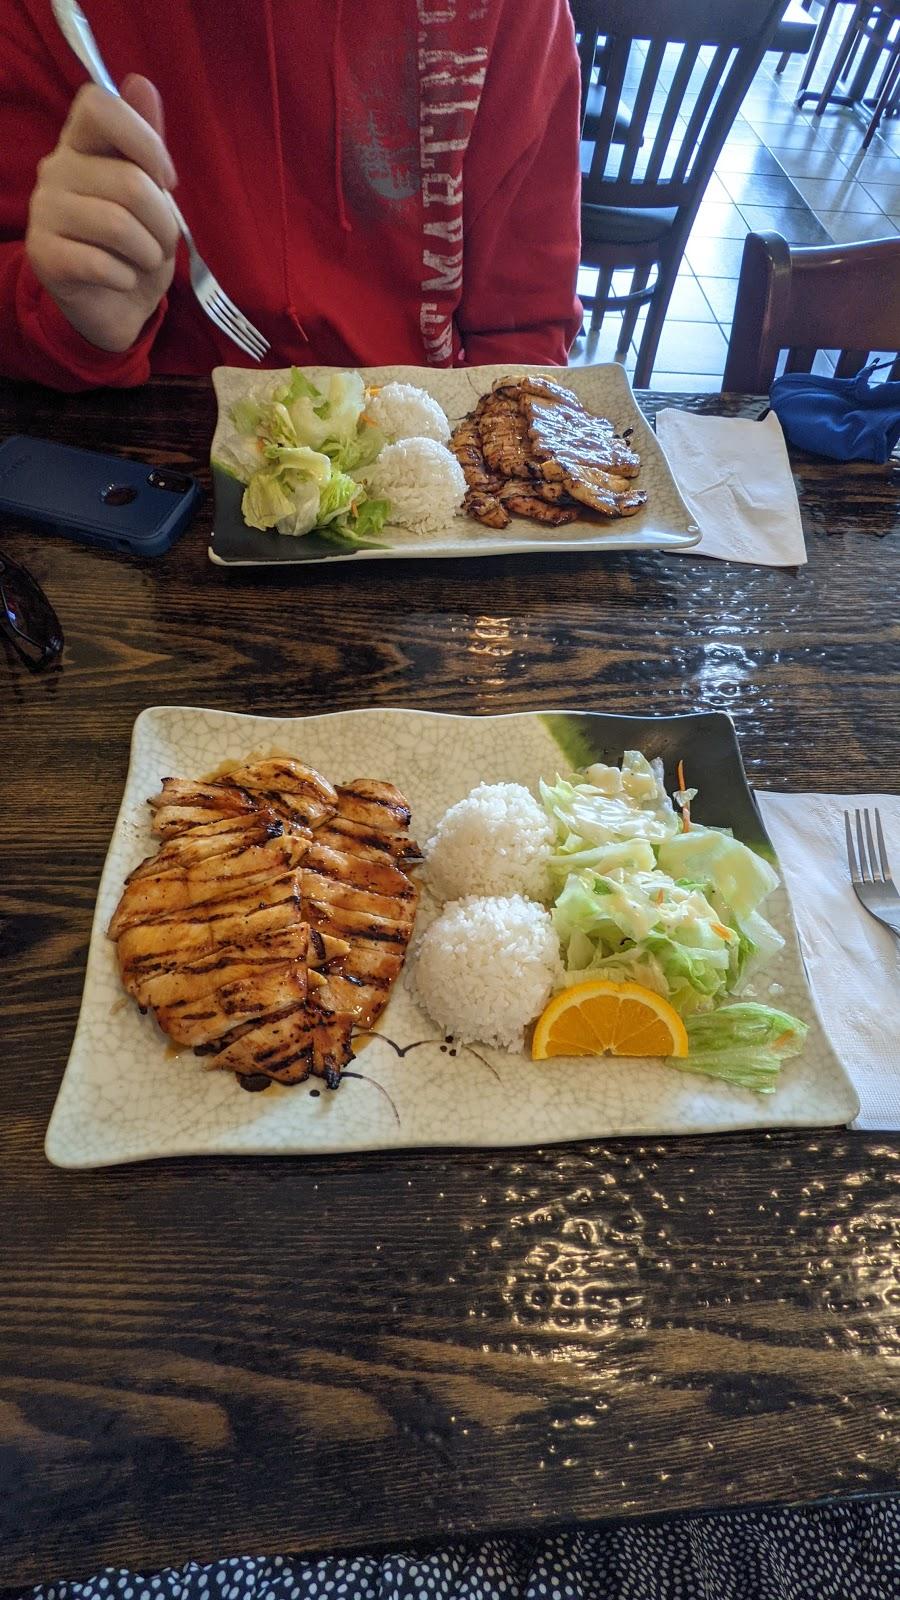 KC Teriyaki - restaurant  | Photo 8 of 10 | Address: 800 NE Tenney Rd B-207, Vancouver, WA 98685, USA | Phone: (360) 573-4261